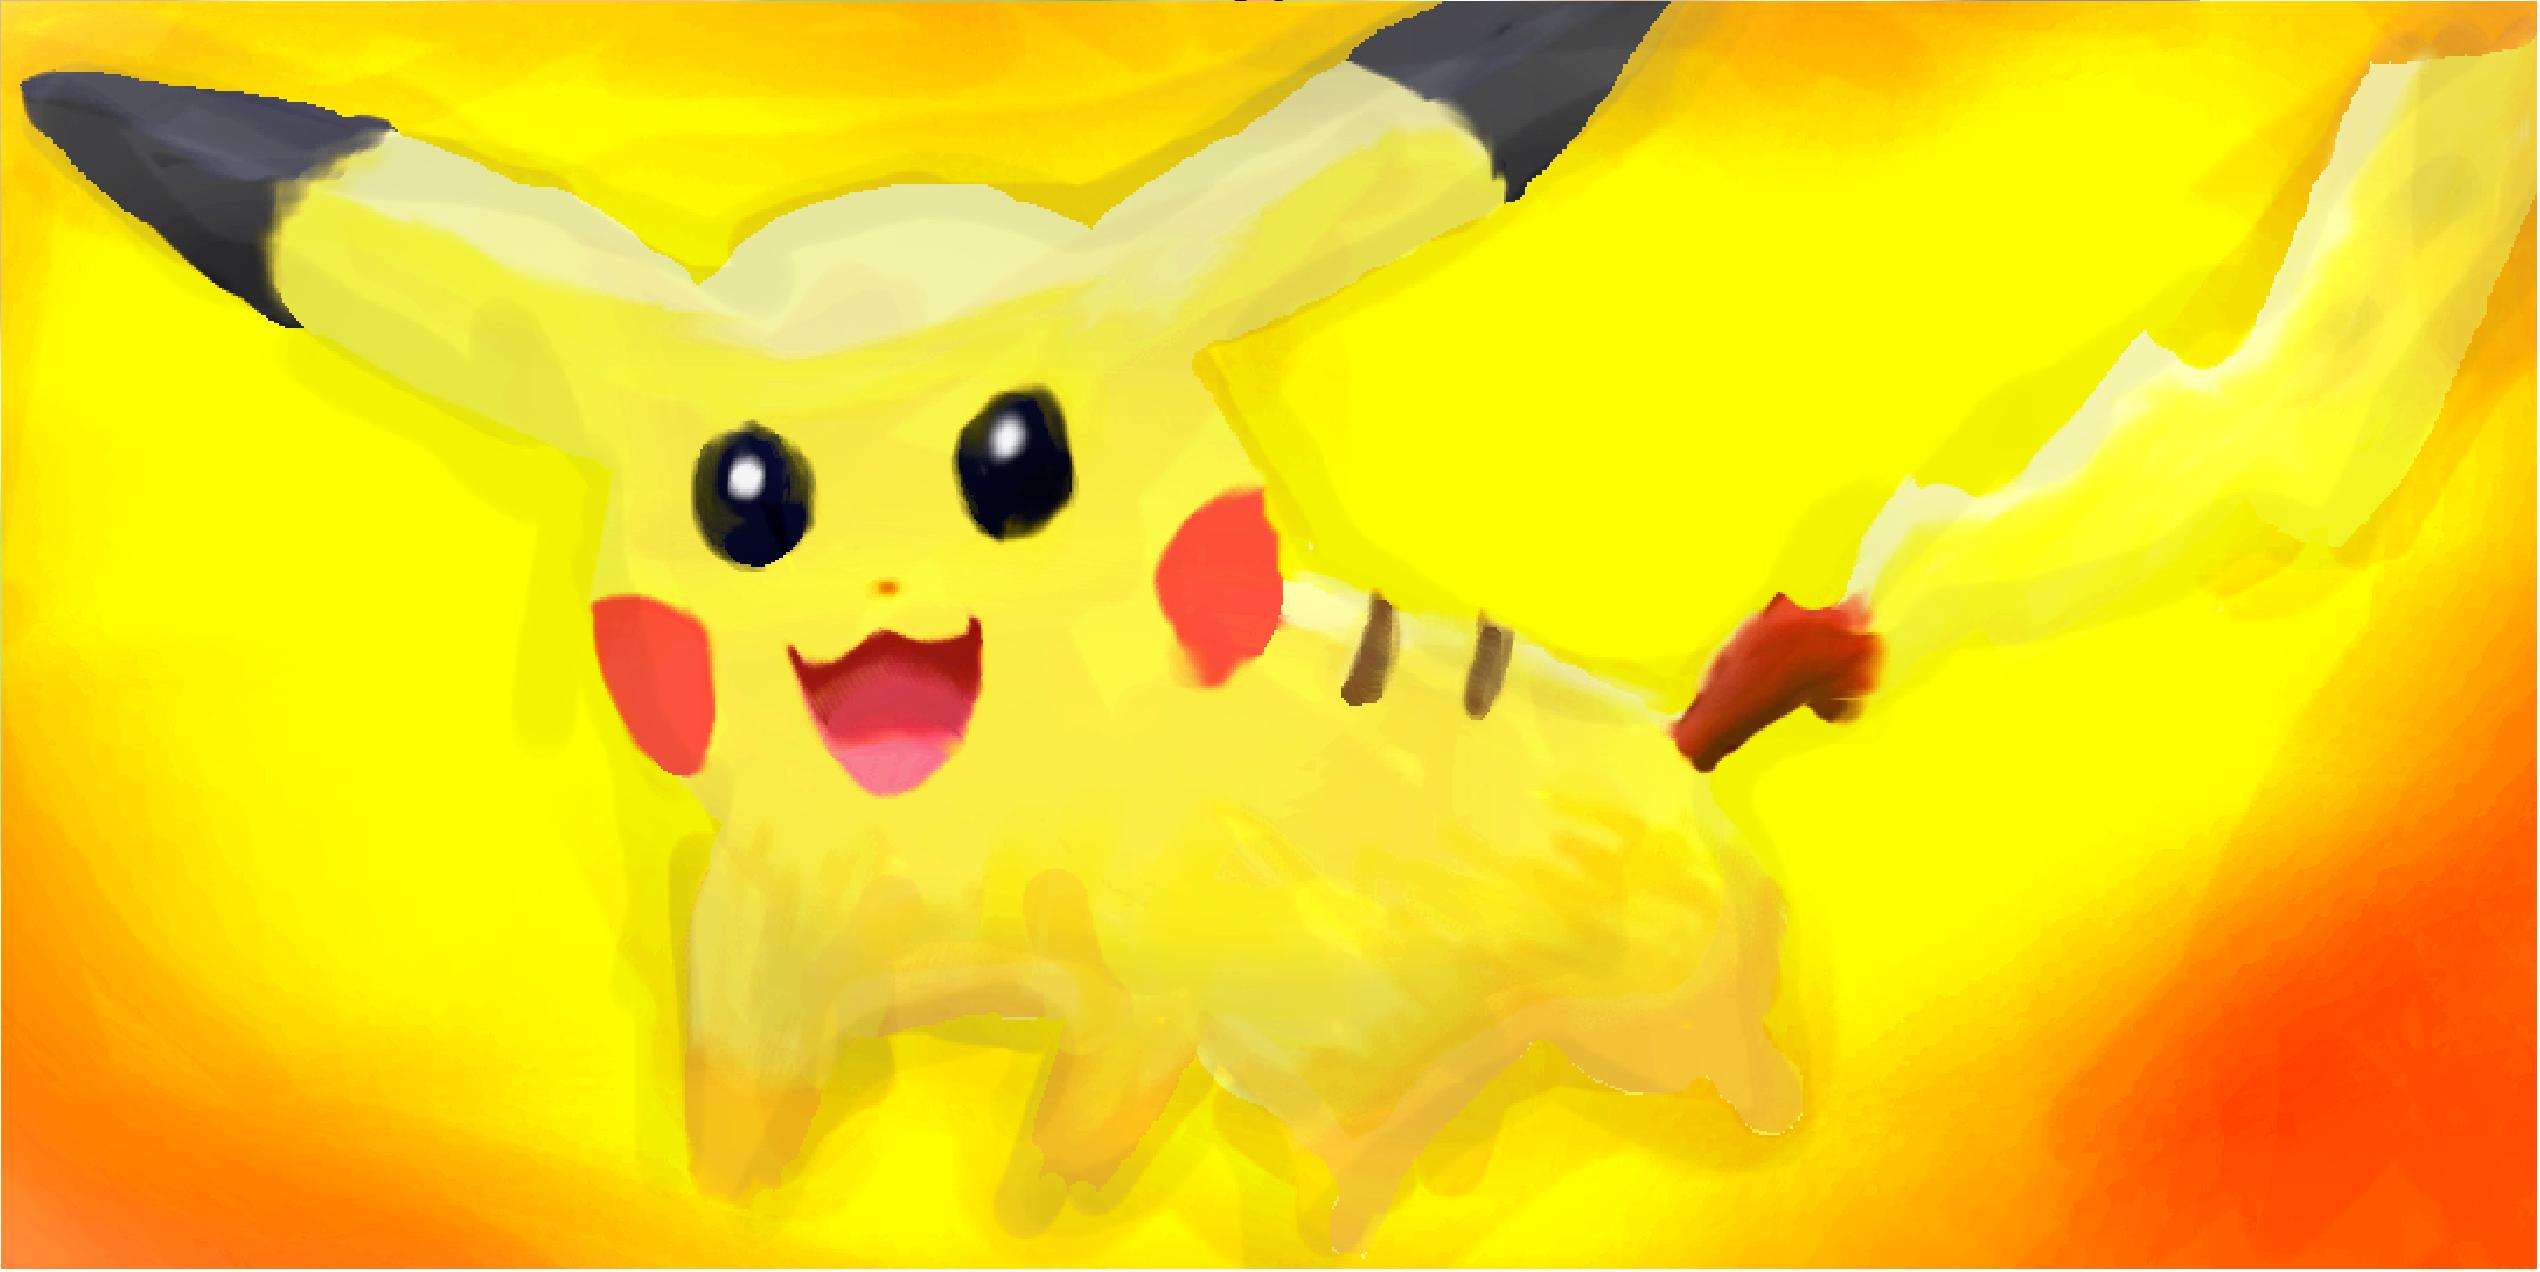 Pokemon: Pikachu - Thundershock by Cleasia on DeviantArt